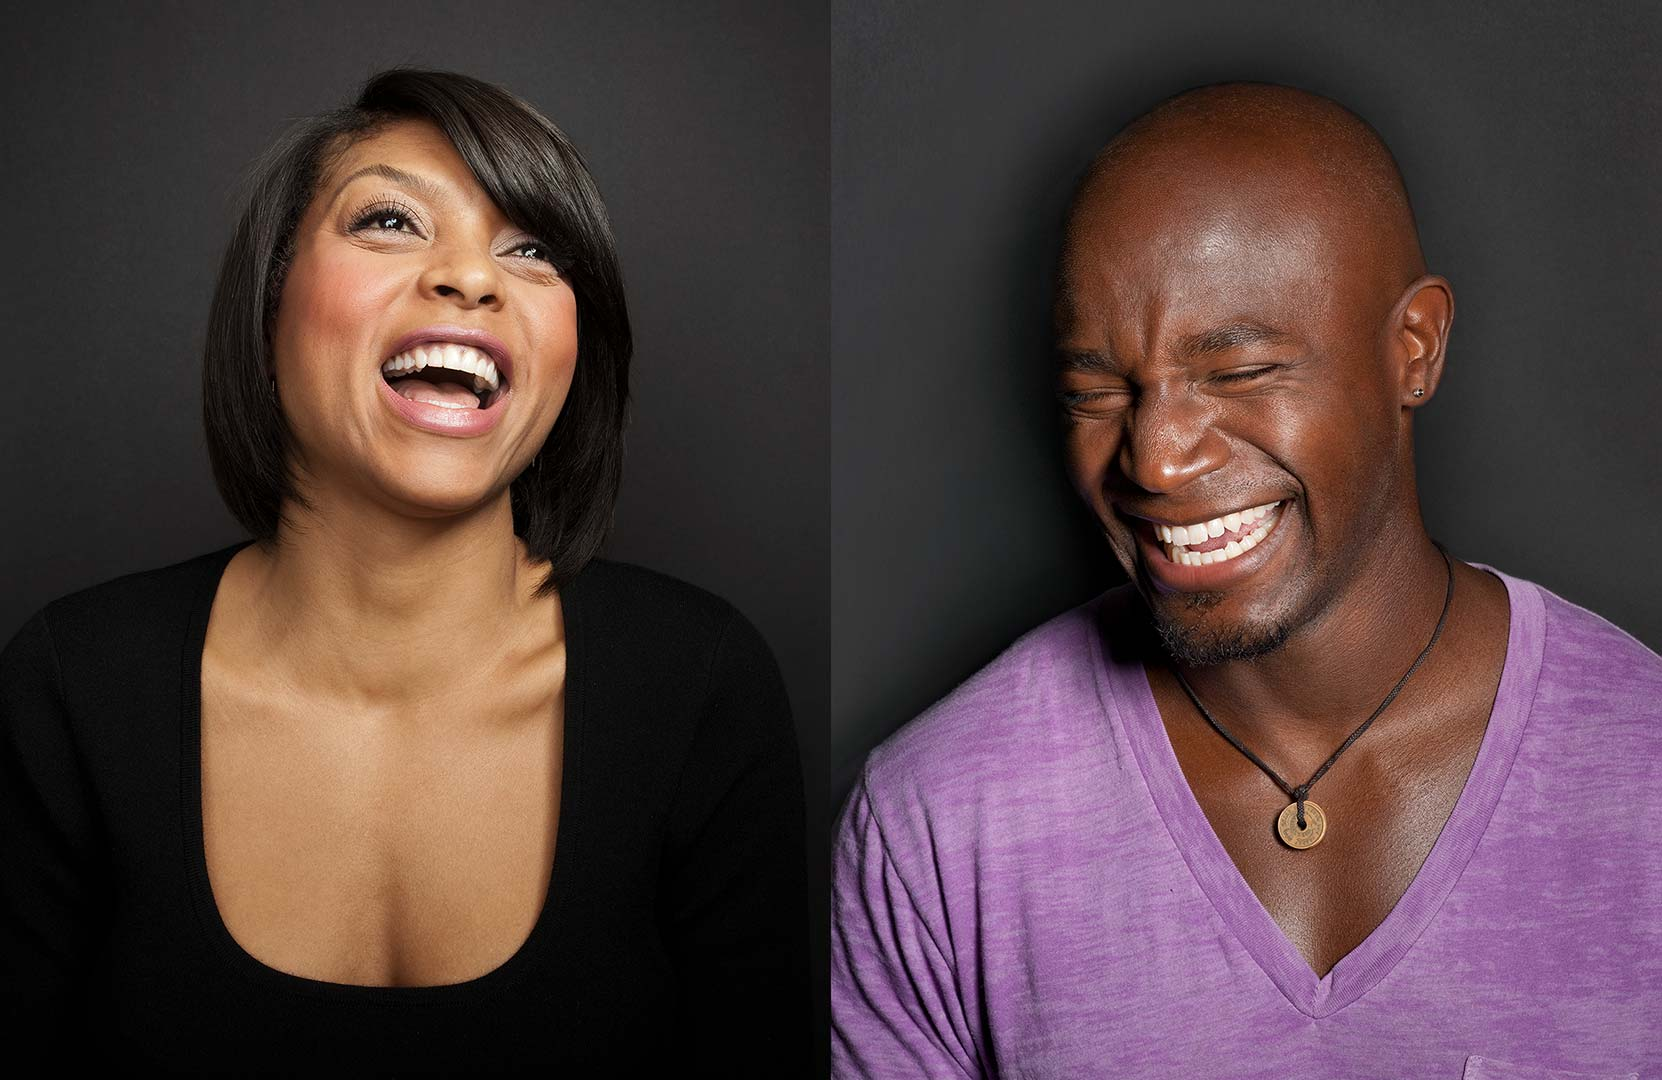 Celebrity portrait photography of Taraji P Henson and Taye Diggs